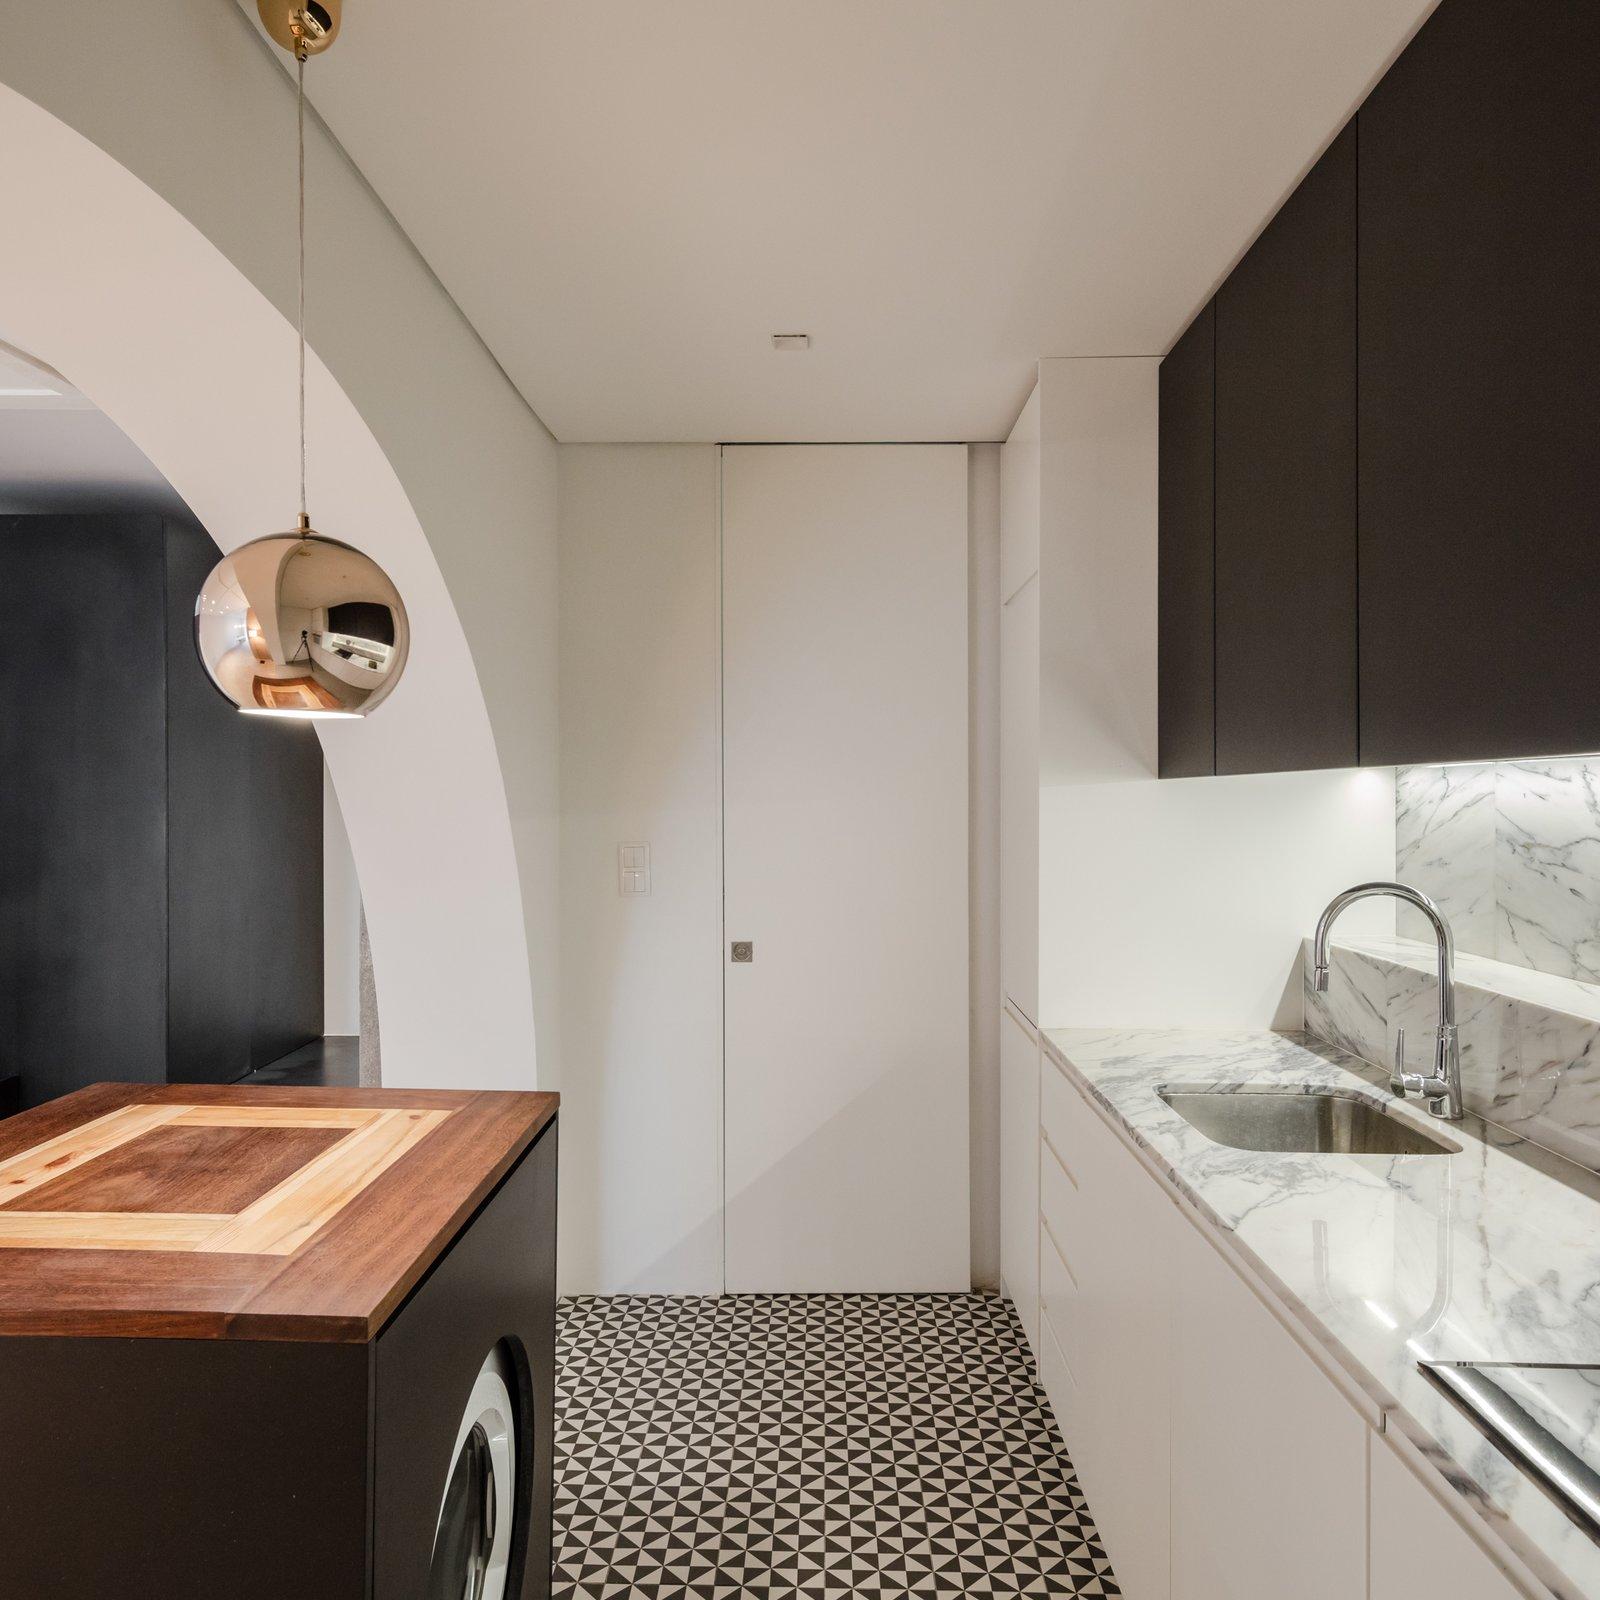 Tagged: Kitchen, Marble Counter, Wood Cabinet, White Cabinet, Ceramic Tile Floor, Stone Slab Backsplashe, Undermount Sink, and Pendant Lighting.  Rua Maria Loft by KEMA studio